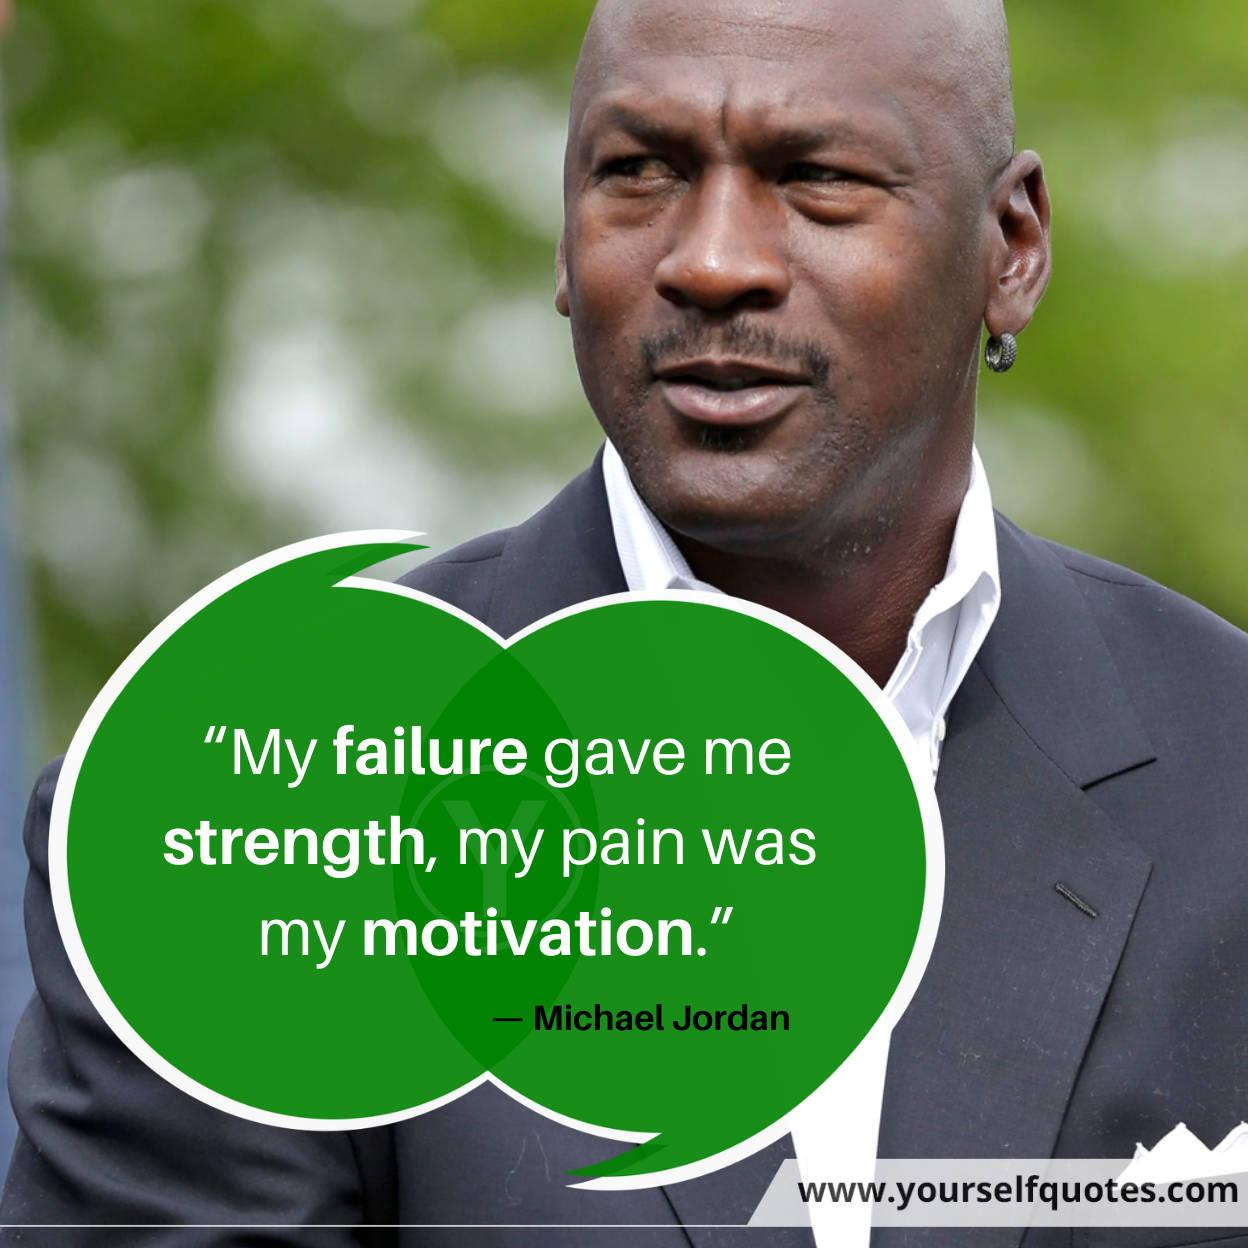 Michael Jordan Quotes Images